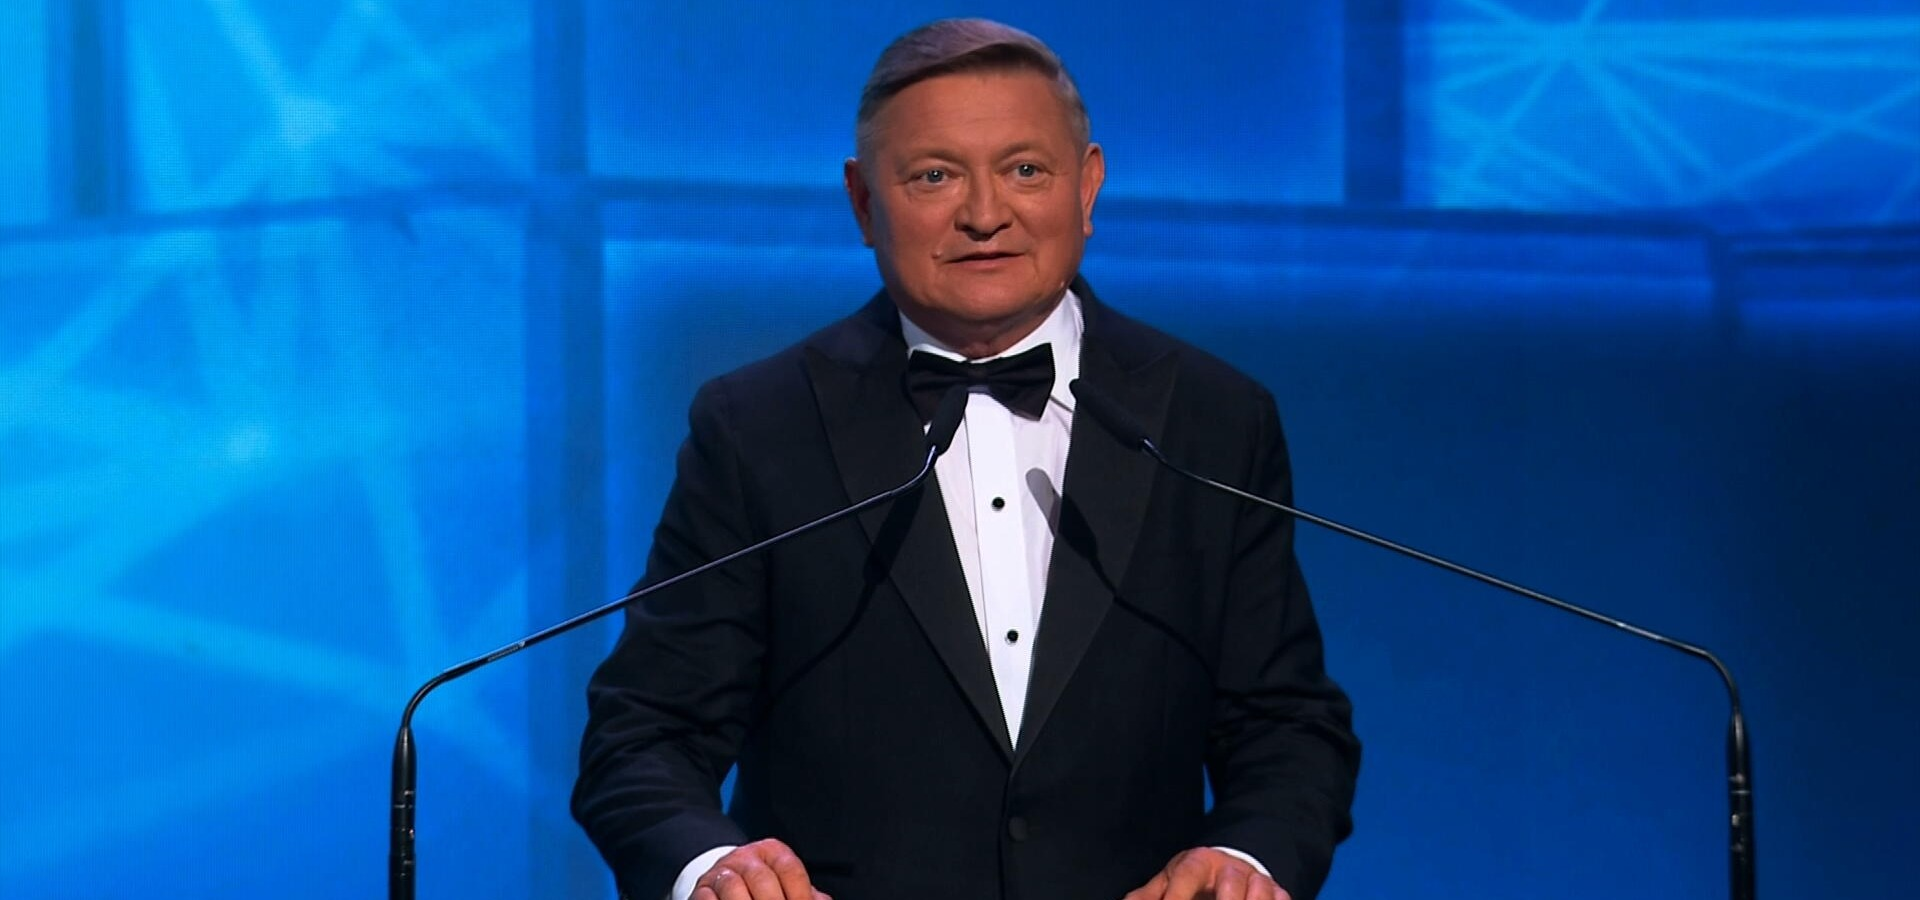 Wojtek Kostrzewa elected as the new President of the Polish Business Roundtable